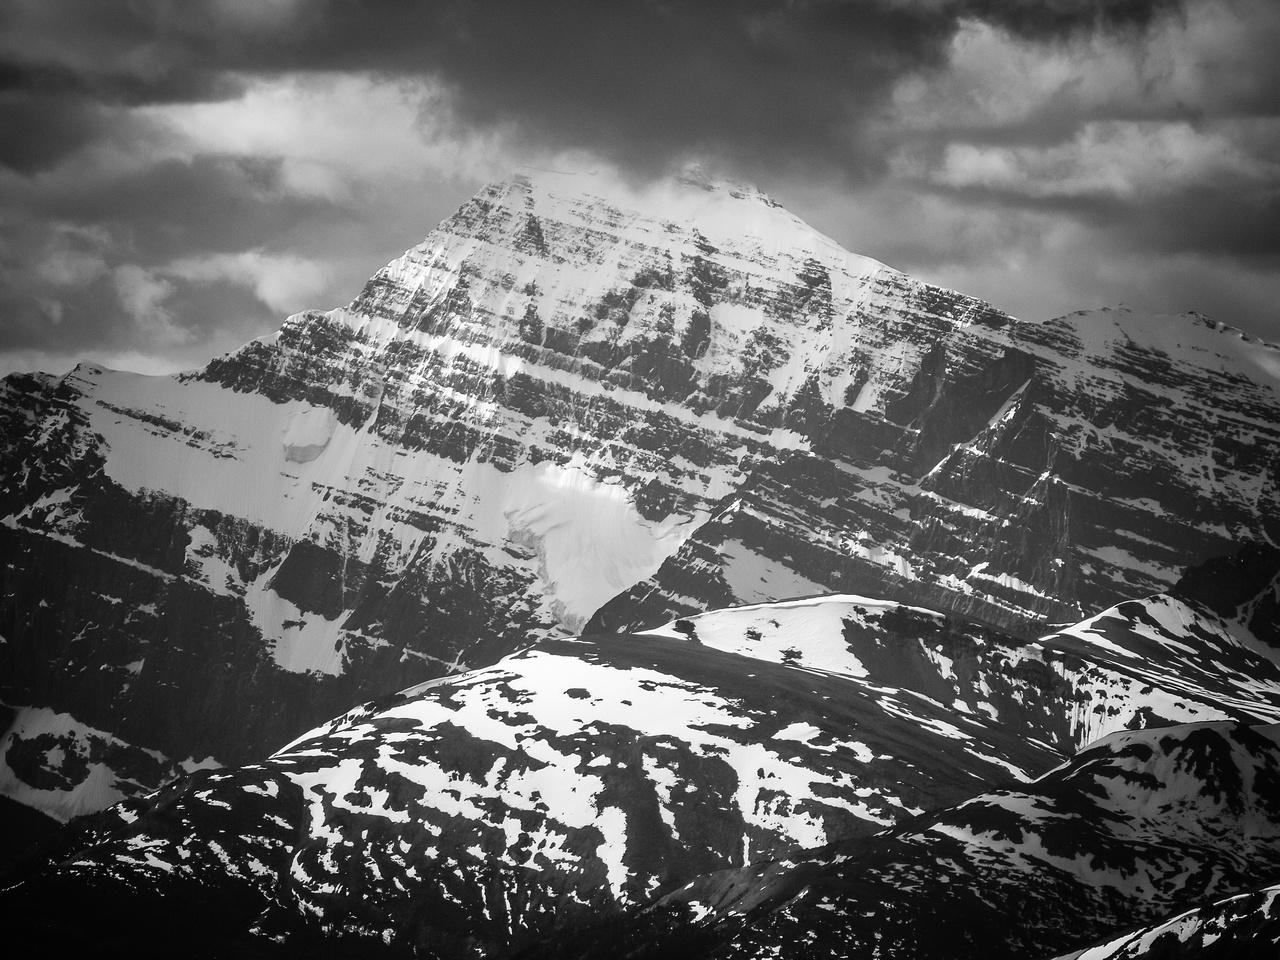 Mount Edith Cavell